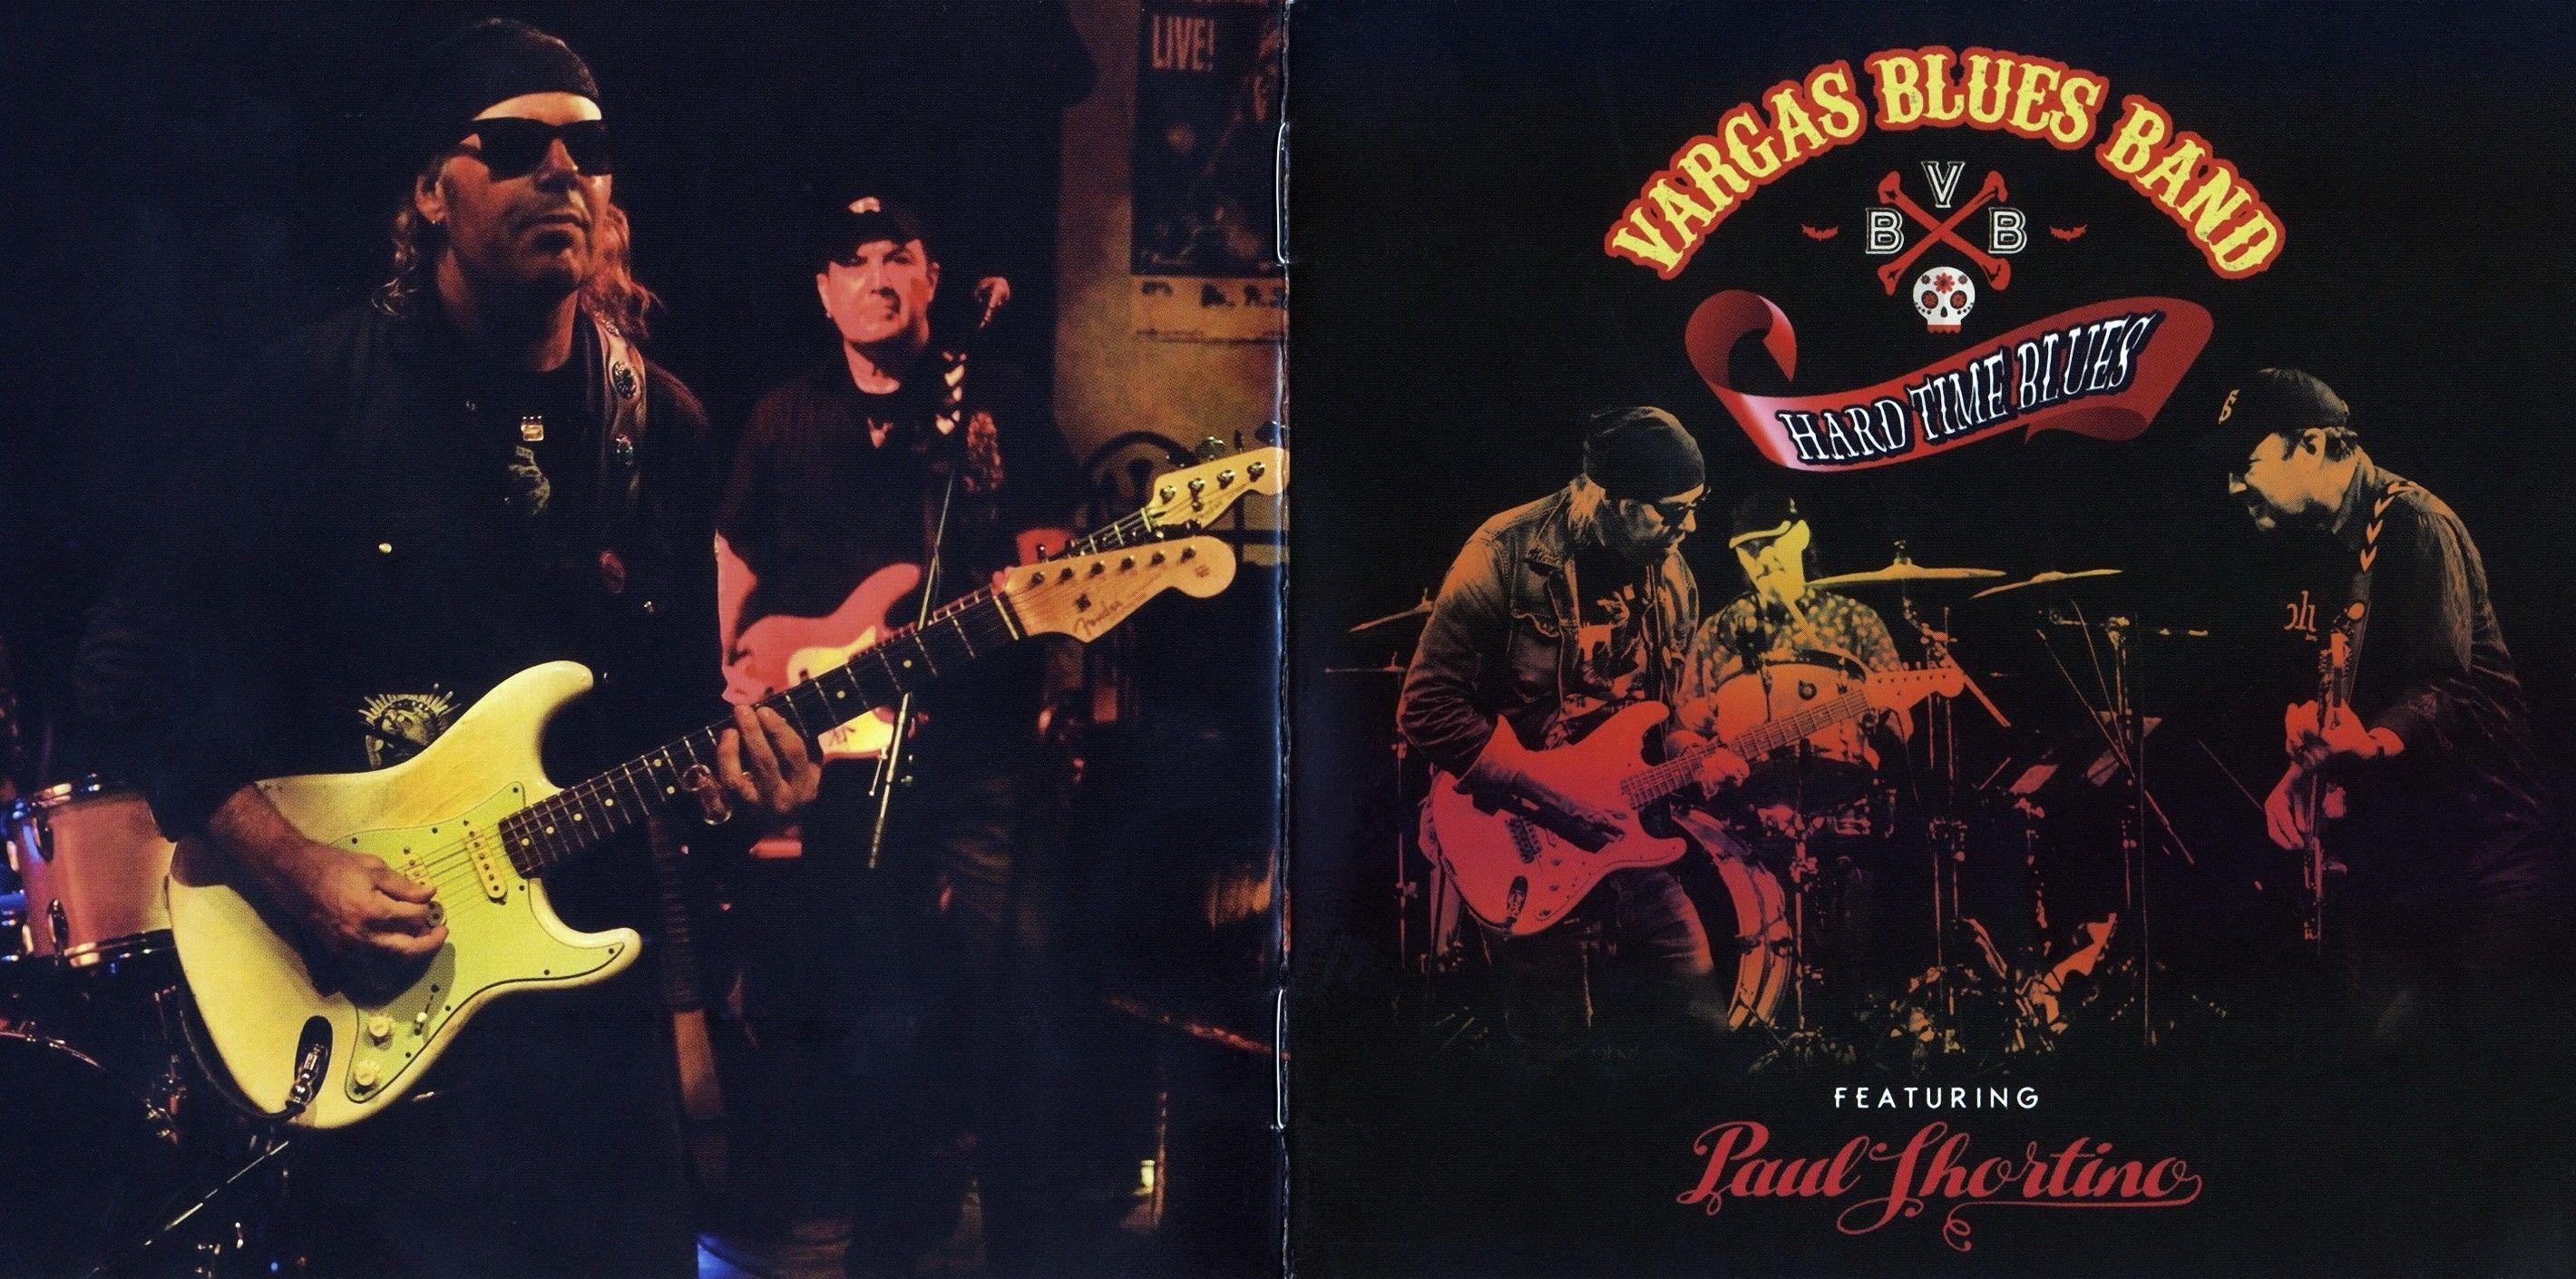 Vargas Blues Band - 2016 - Hard Time Blues